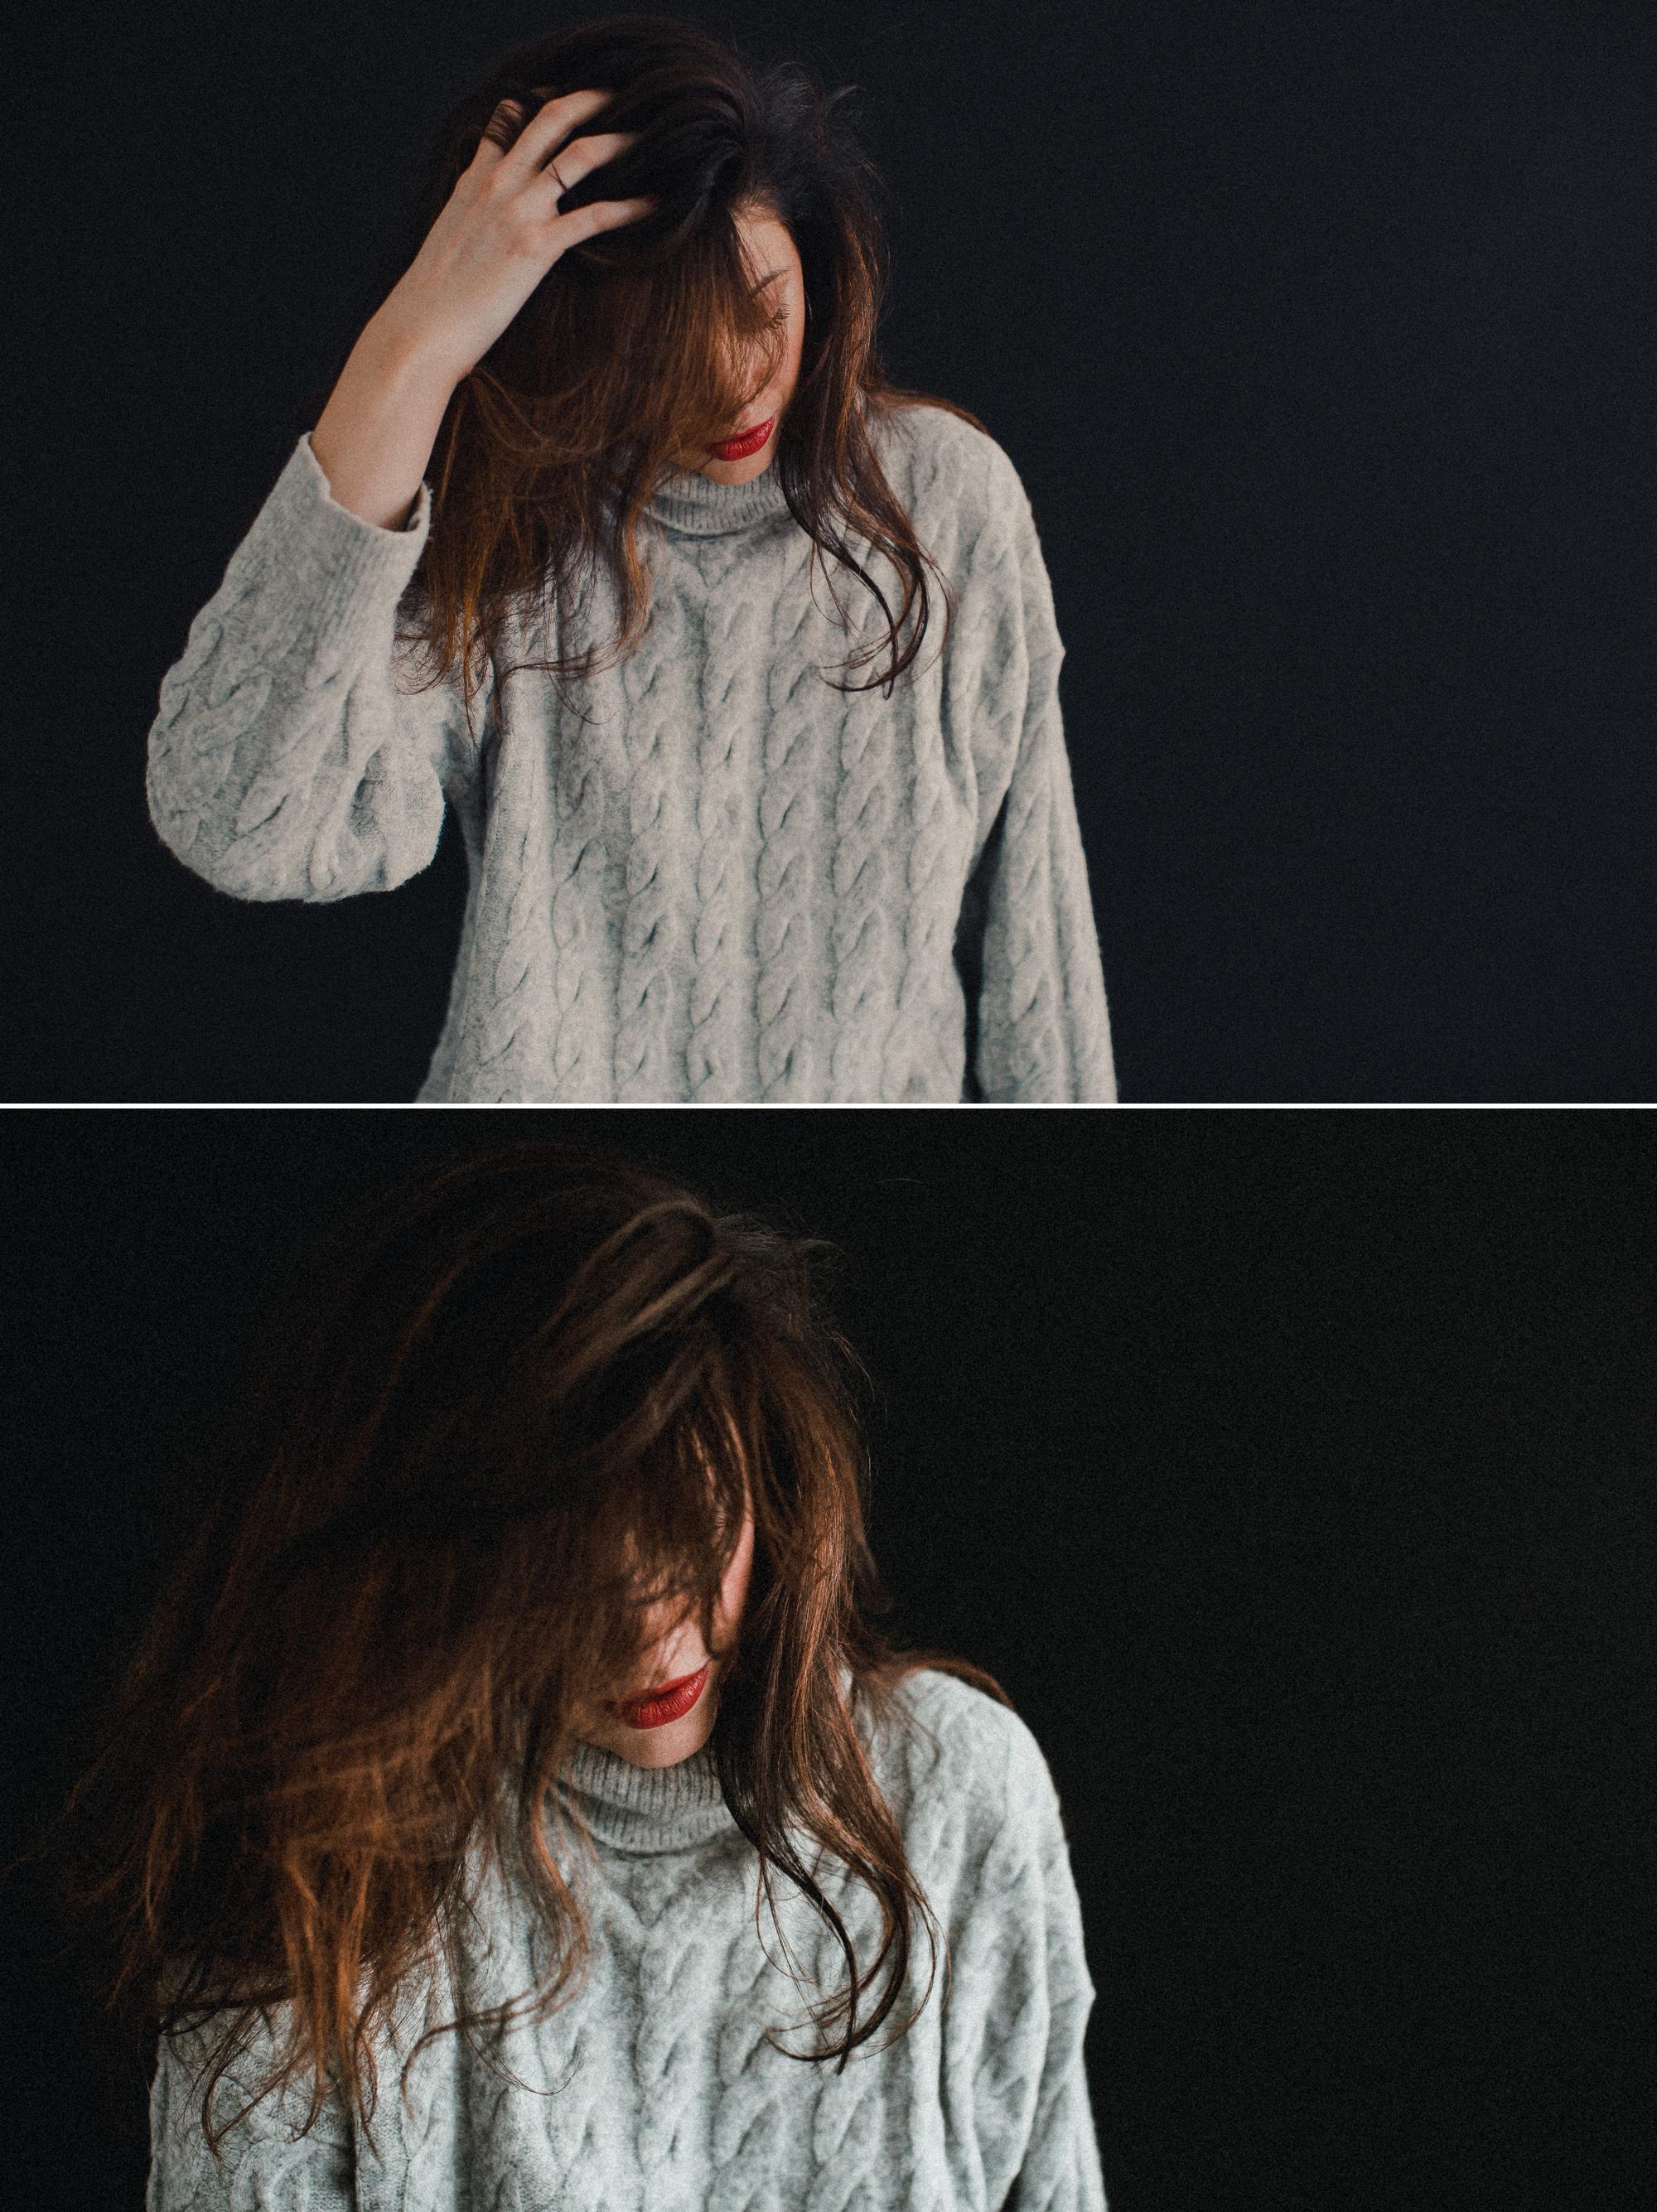 lifestyle-fashion-studio-portrait 7.jpg